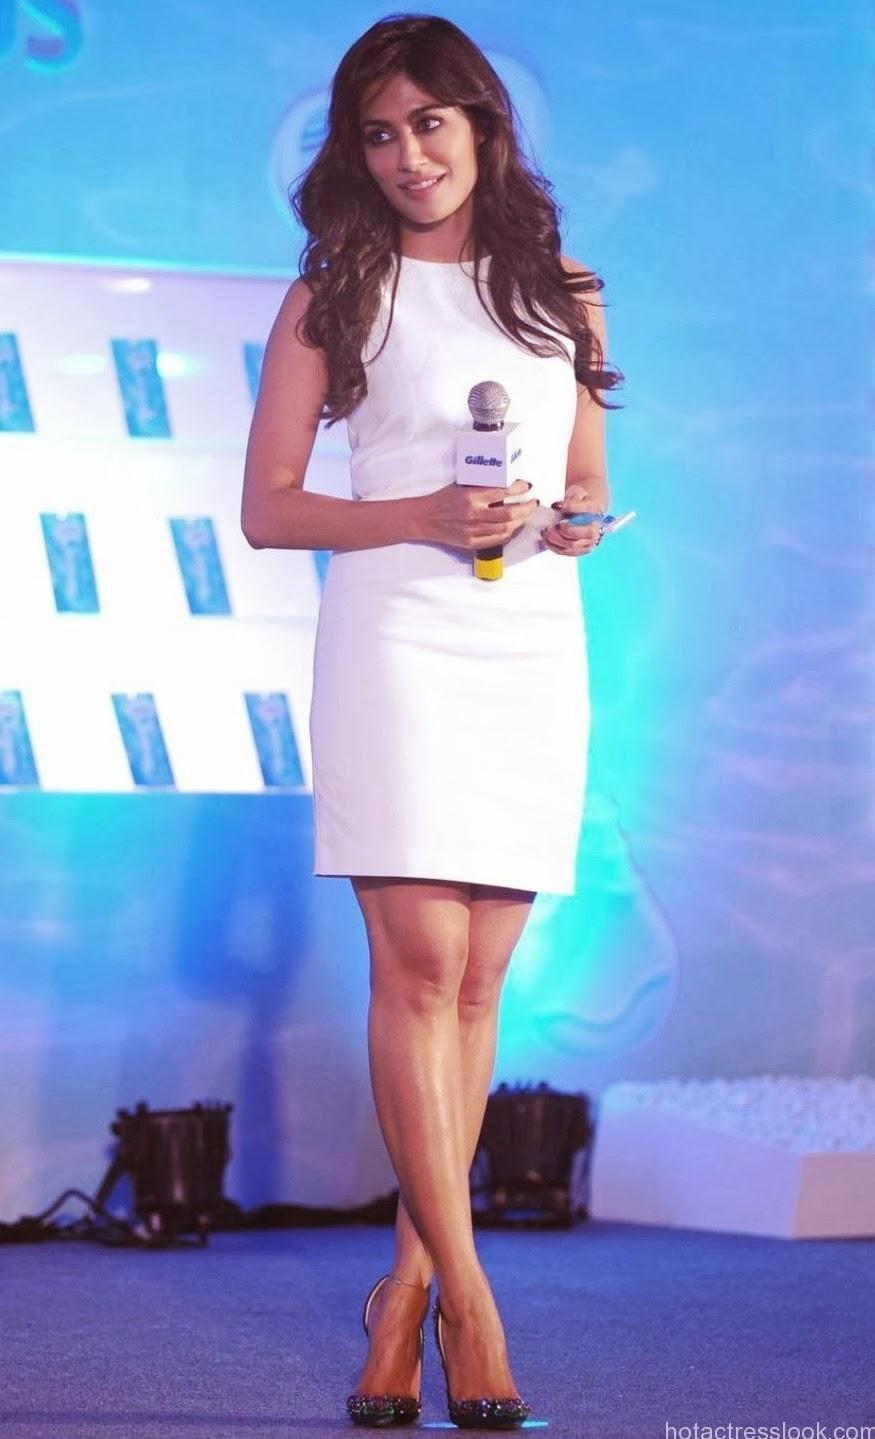 Chitrangada Singh looks hot in shorts